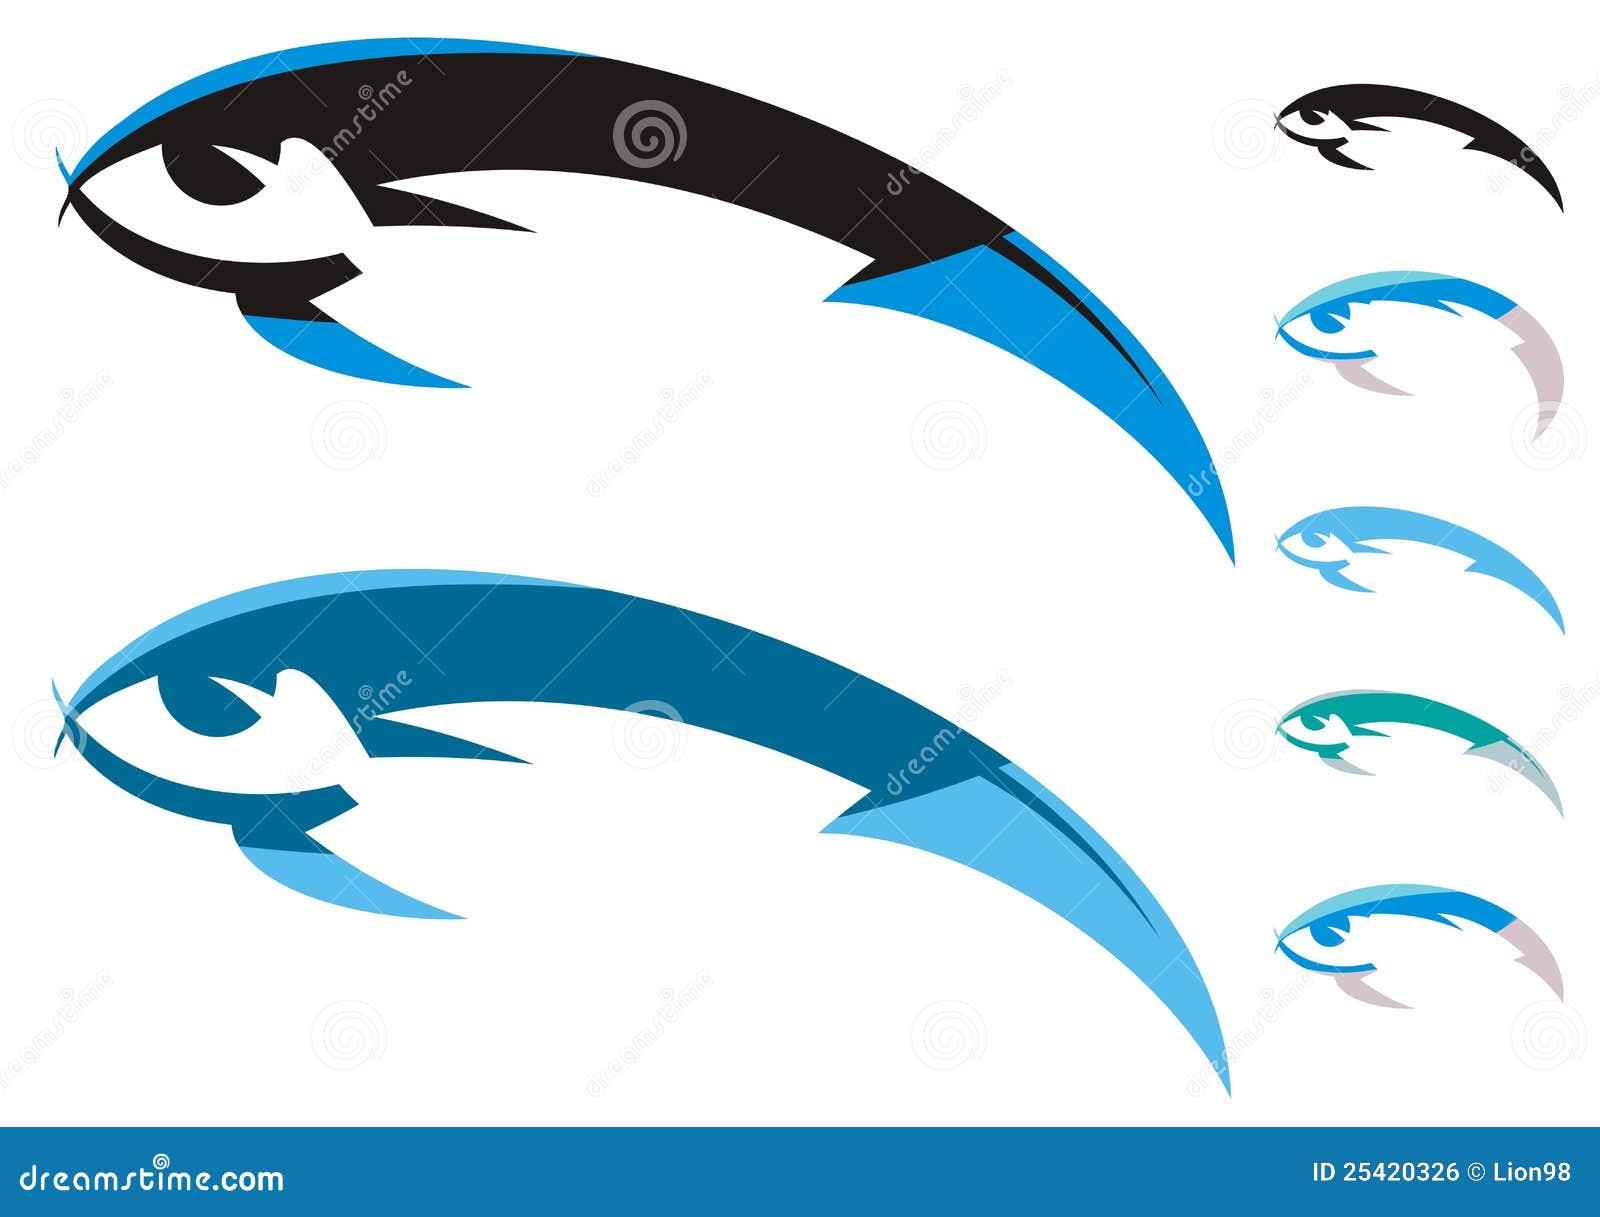 Fish symbols stock vector illustration of ocean nature for Dream interpretation fish